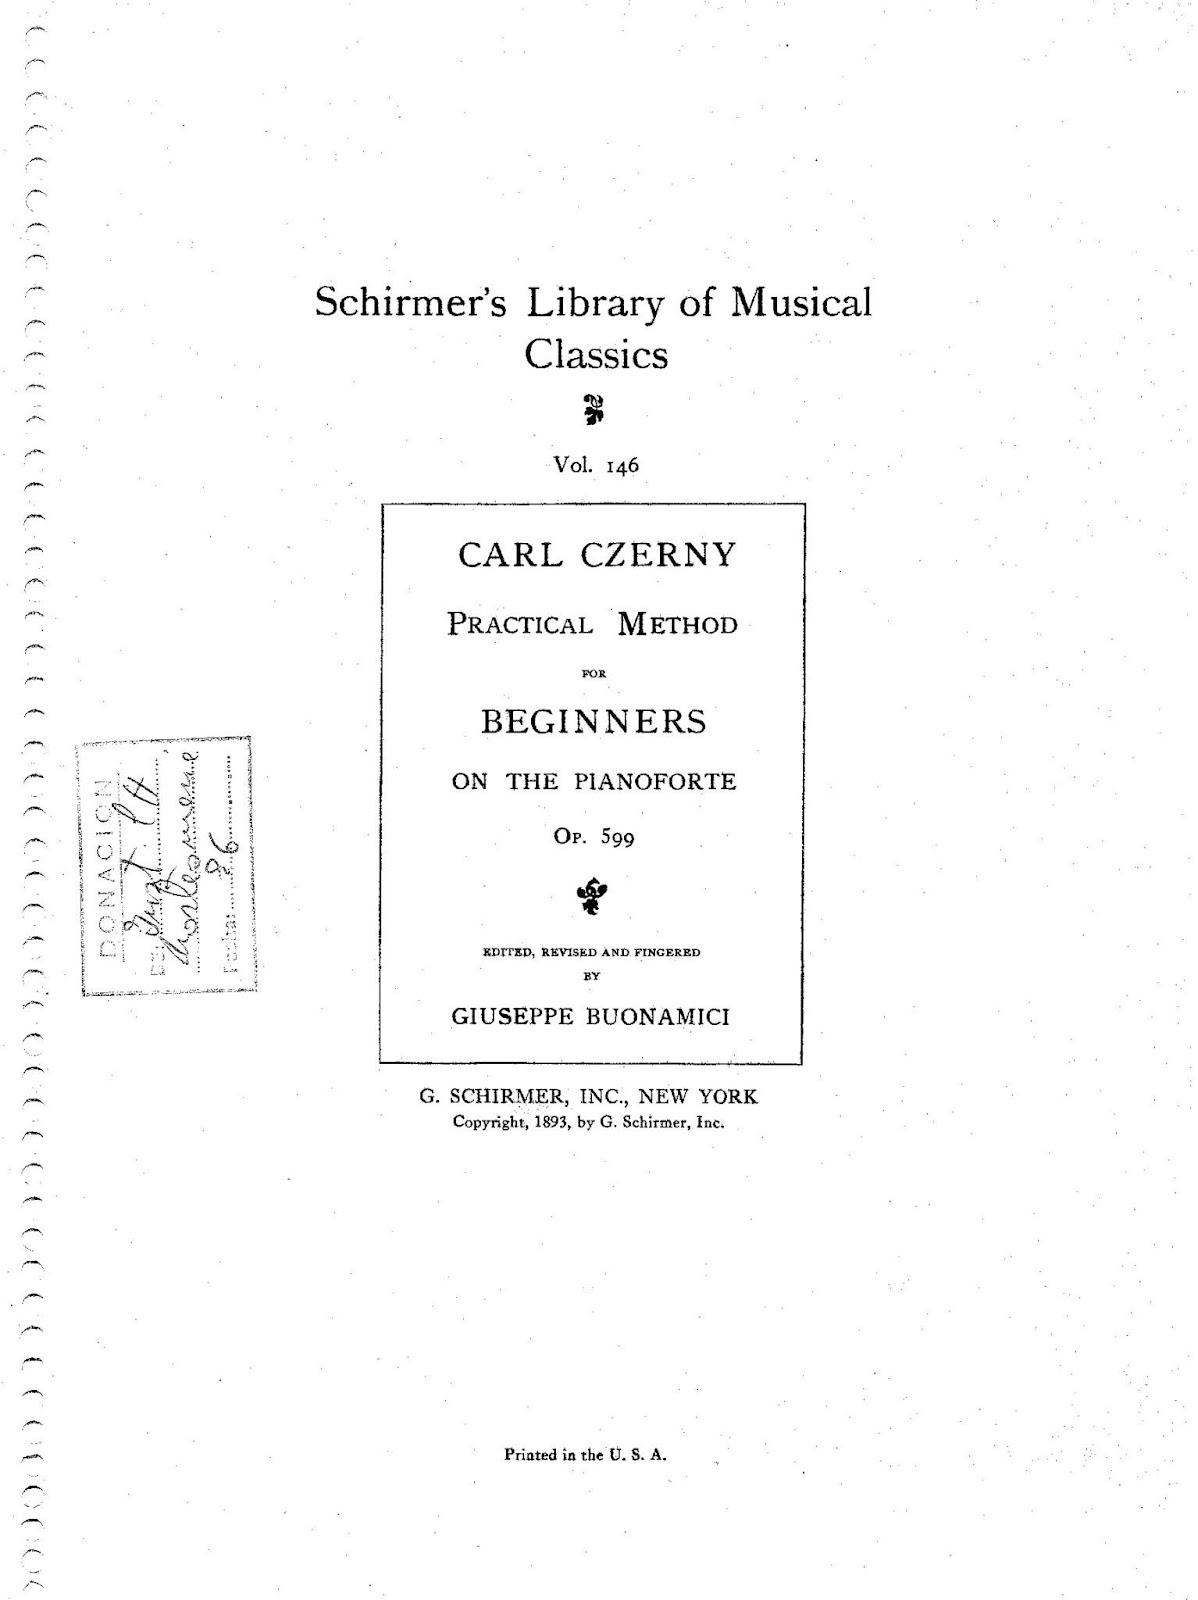 دانلود کتاب پیانو کارل چرنی اپوس ۵۹۹